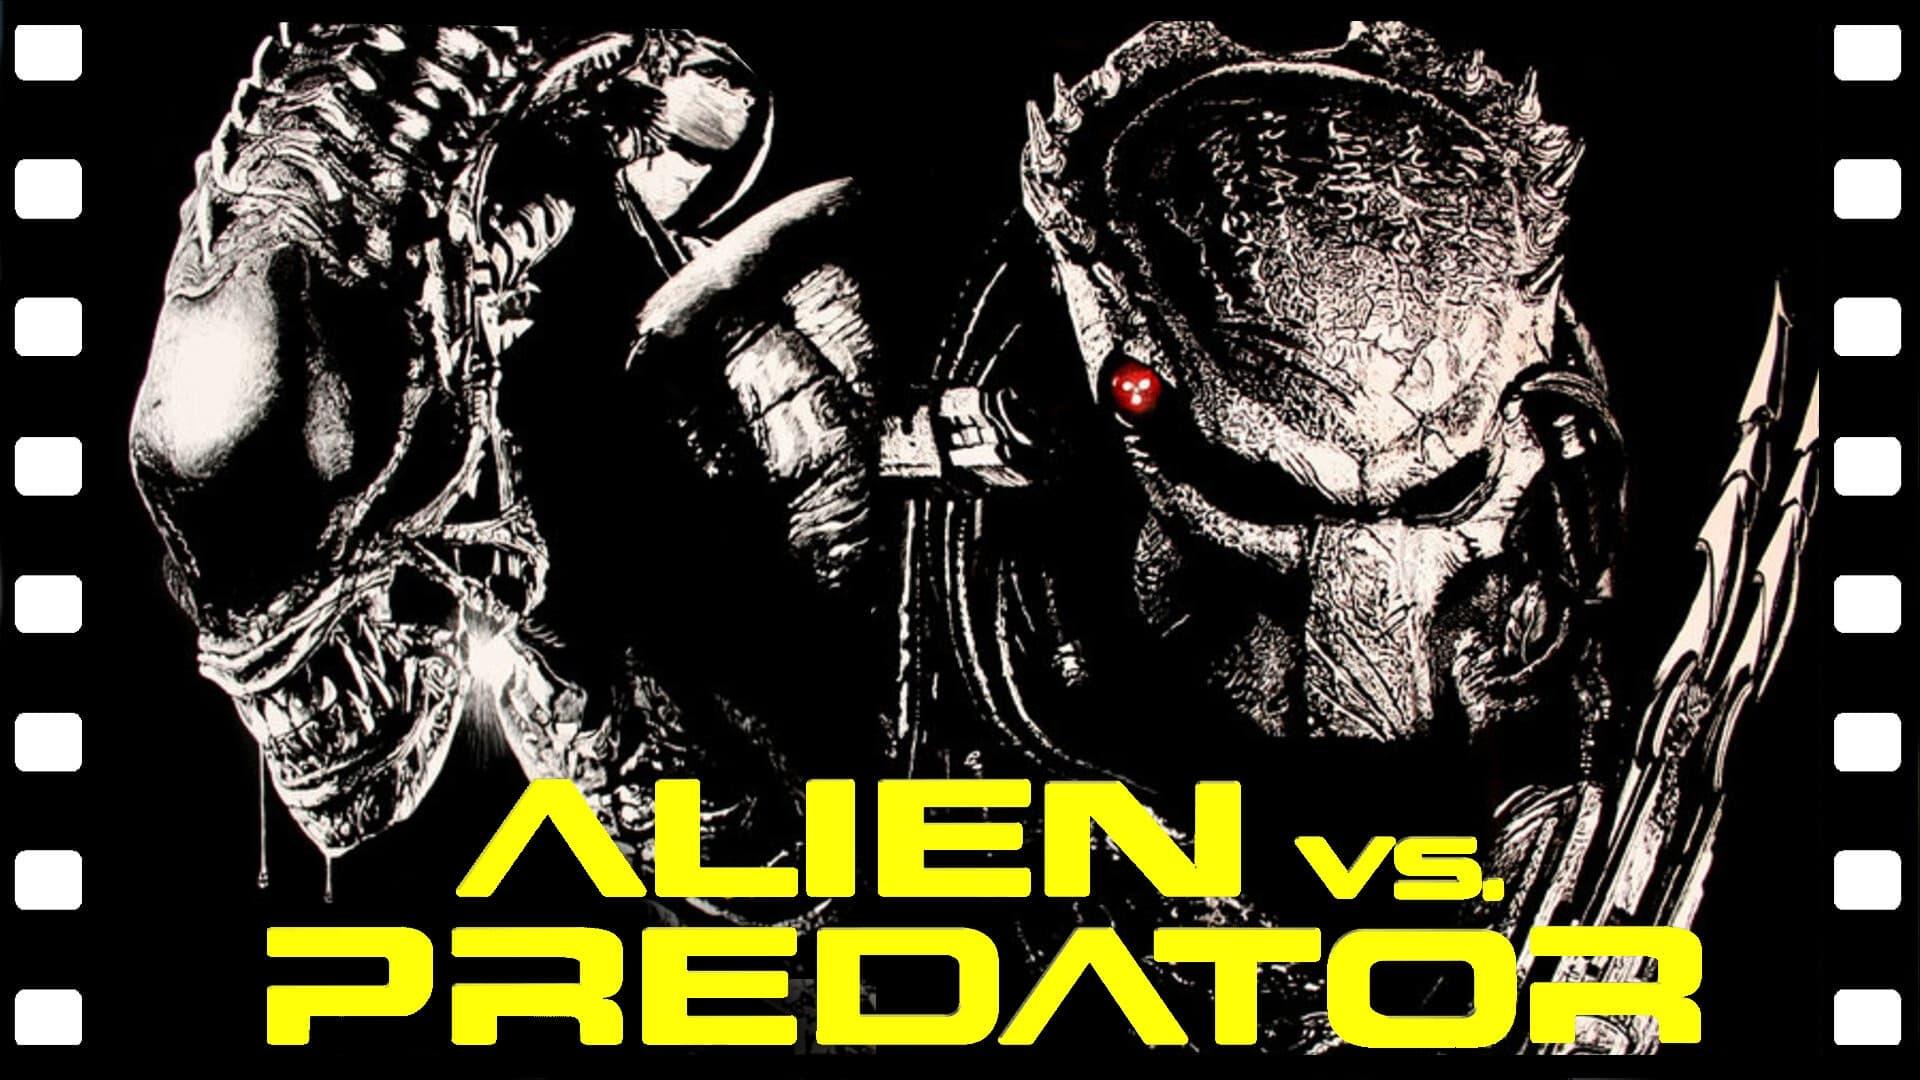 Alien vs. Predator - A Halál a Ragadozó ellen (2004)